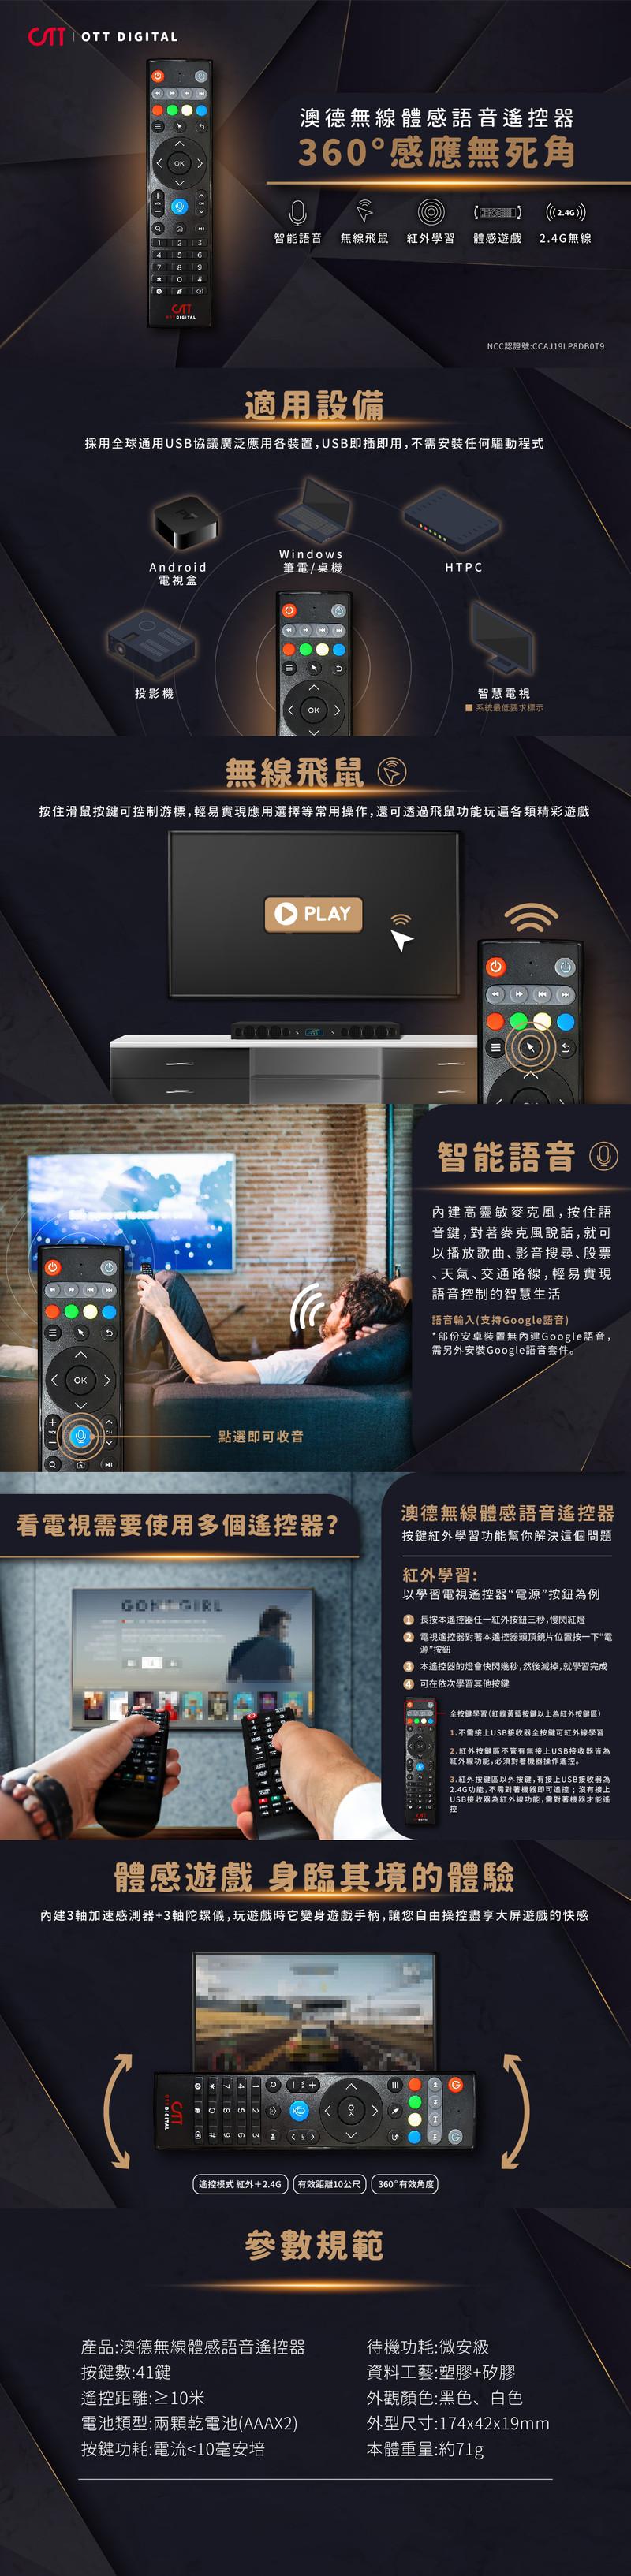 OTT-澳德無線體感語⾳遙控器-產品說明設計-5_總圖.jpg